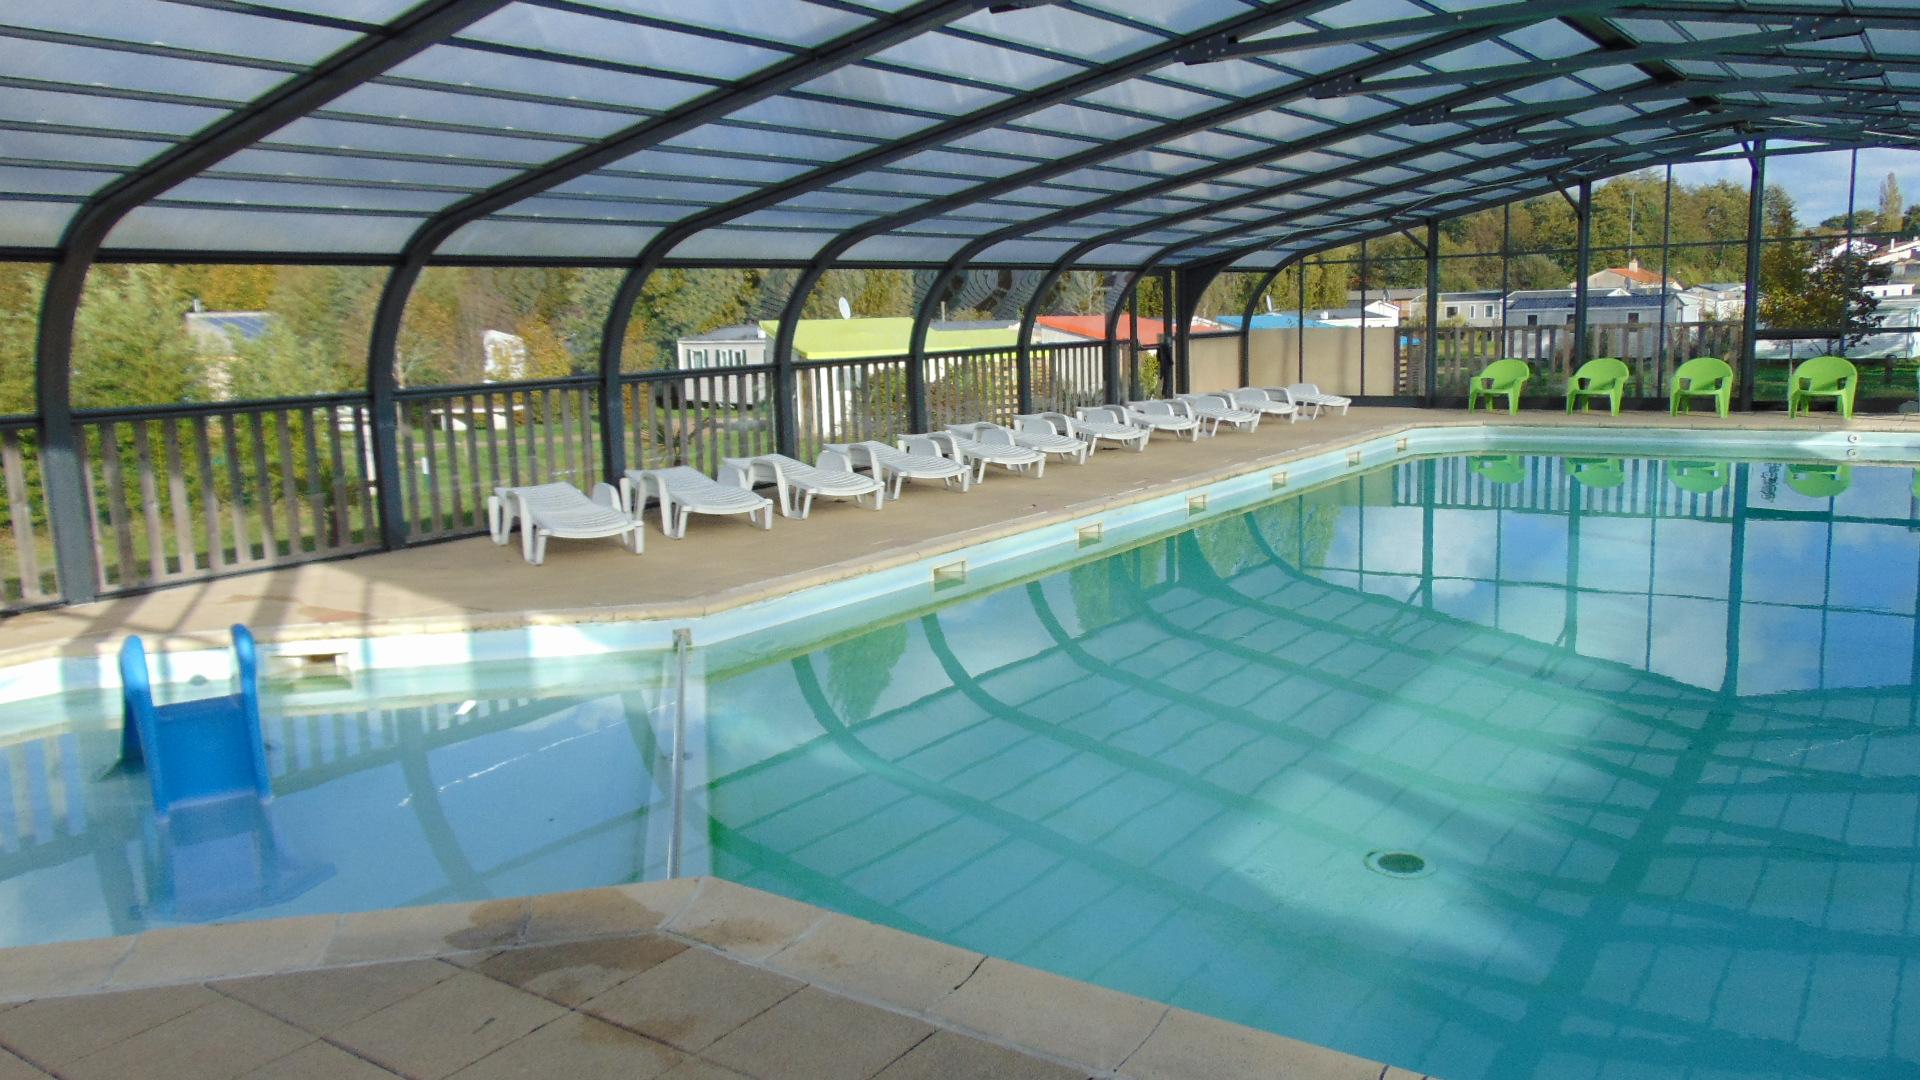 Camping vend e avec piscine couverte for Cantal camping avec piscine